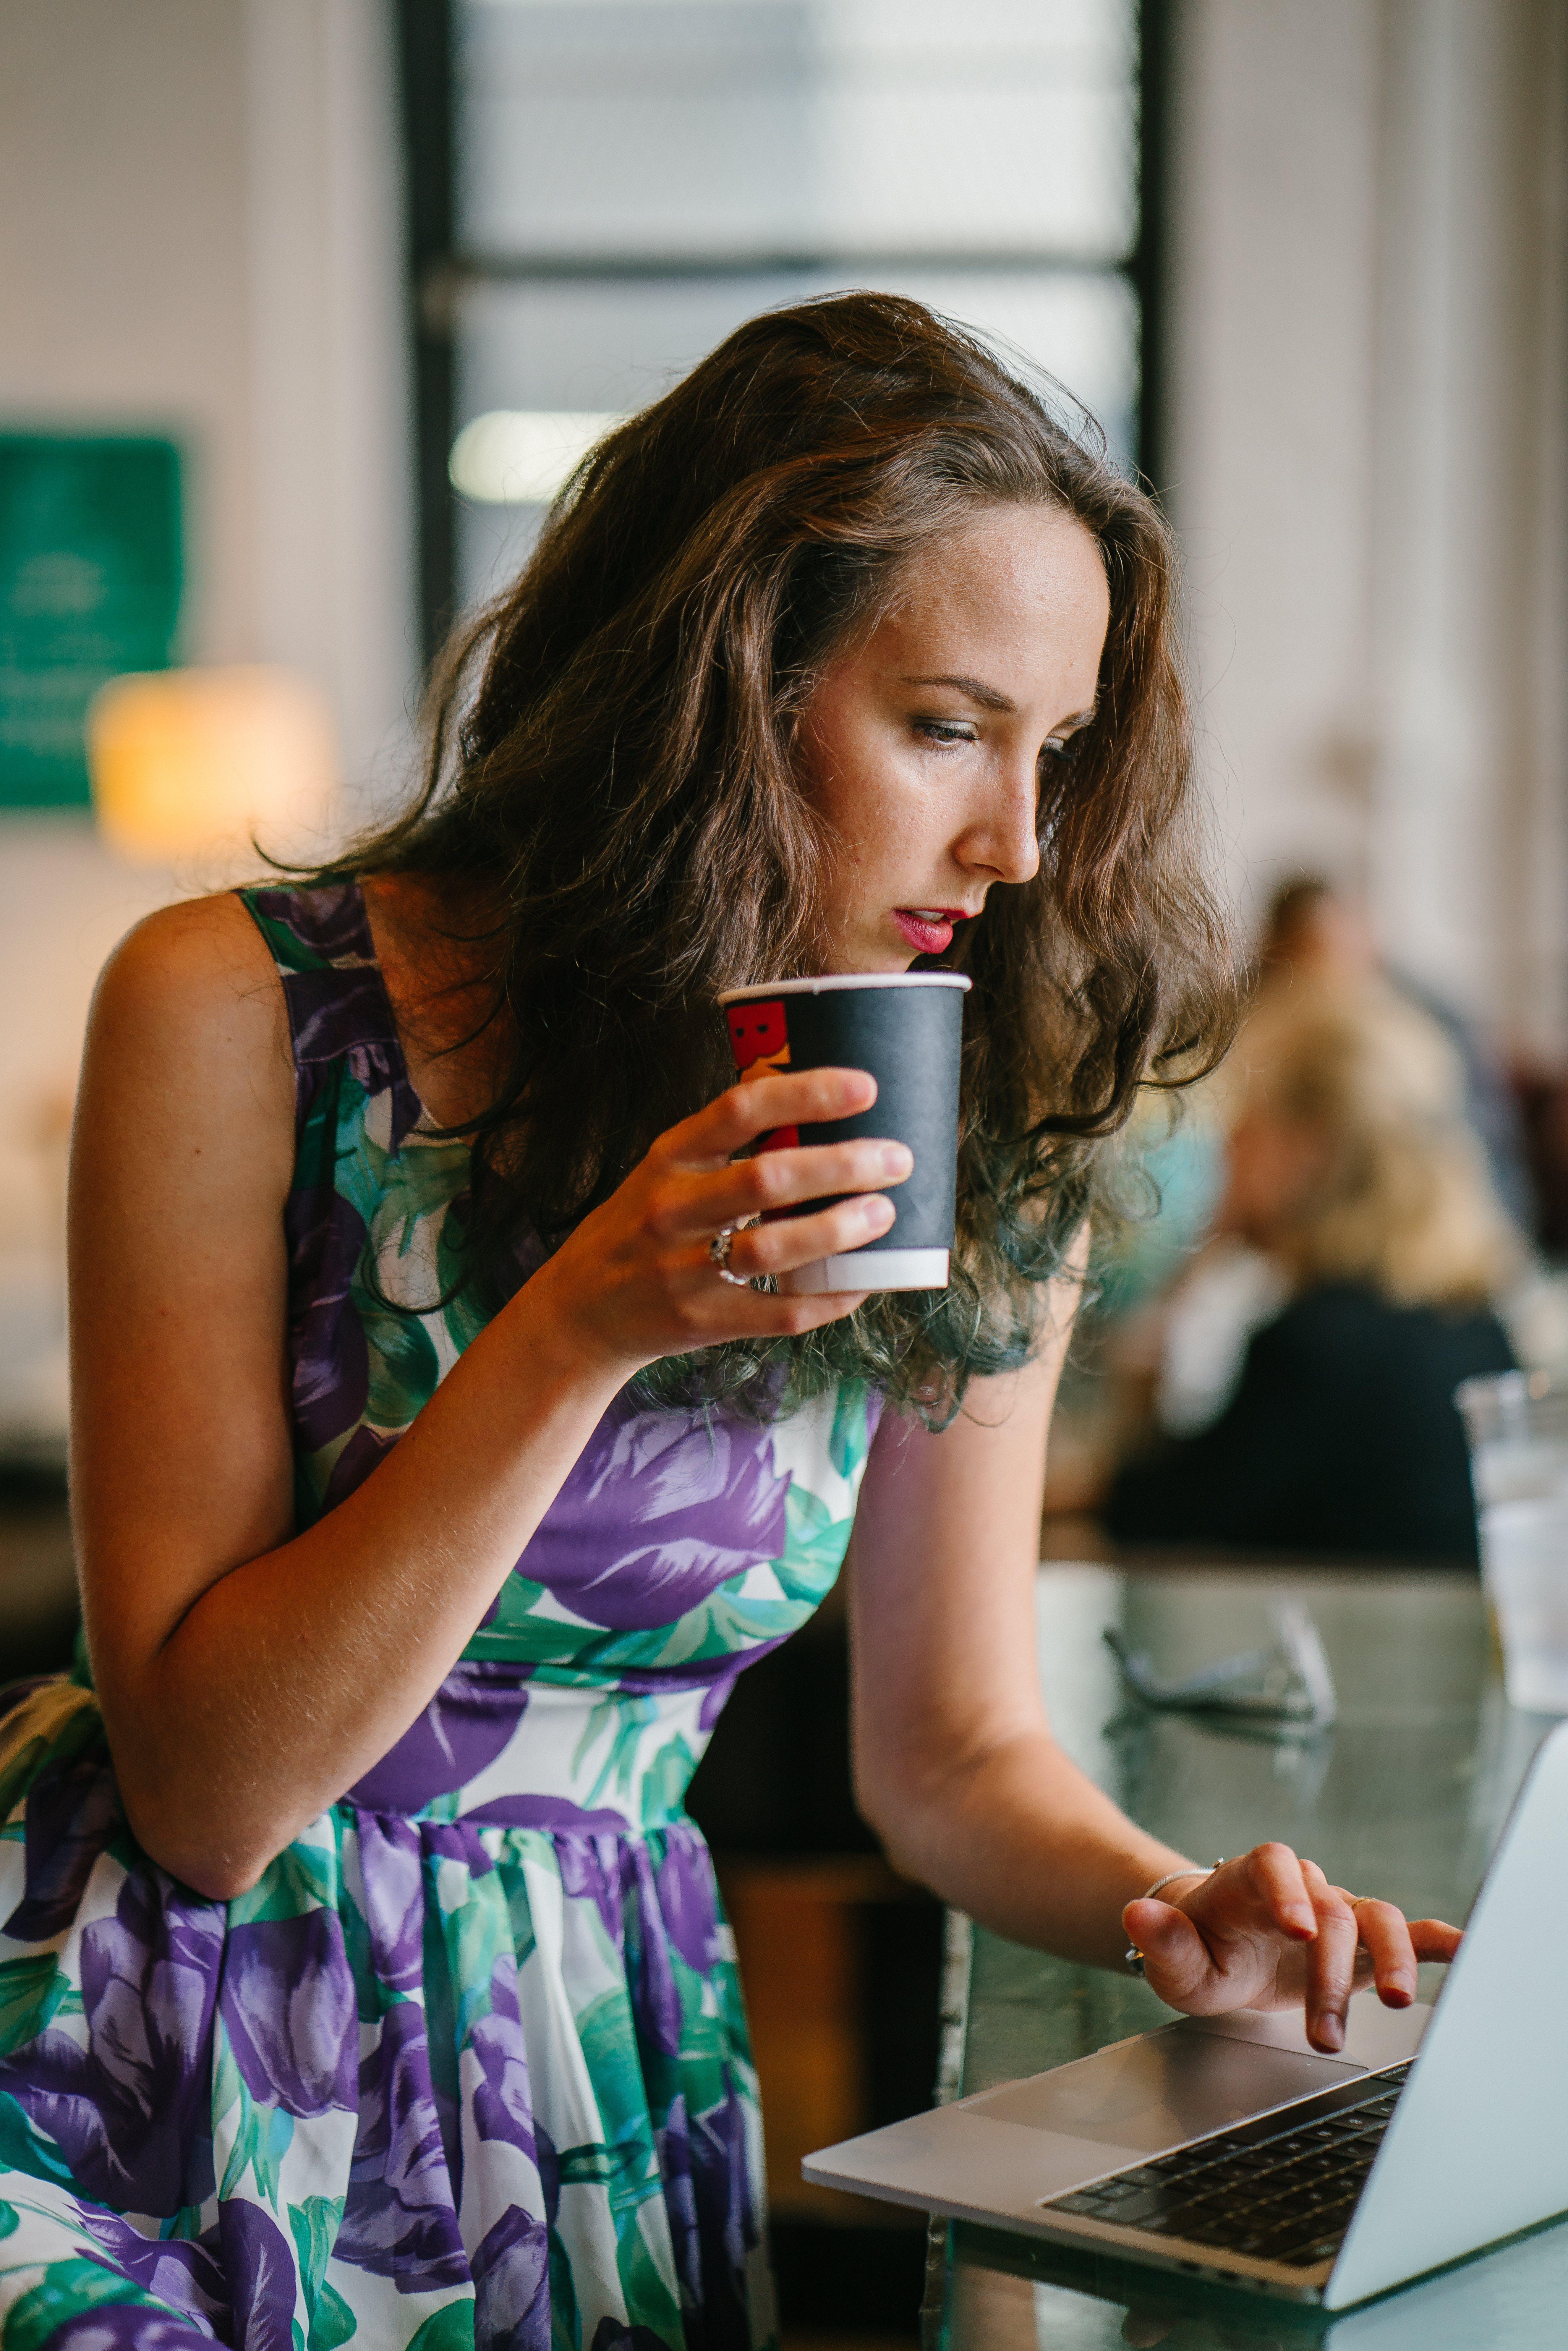 Kostenloses Stock Foto zu frau, kaffee, tasse, laptop